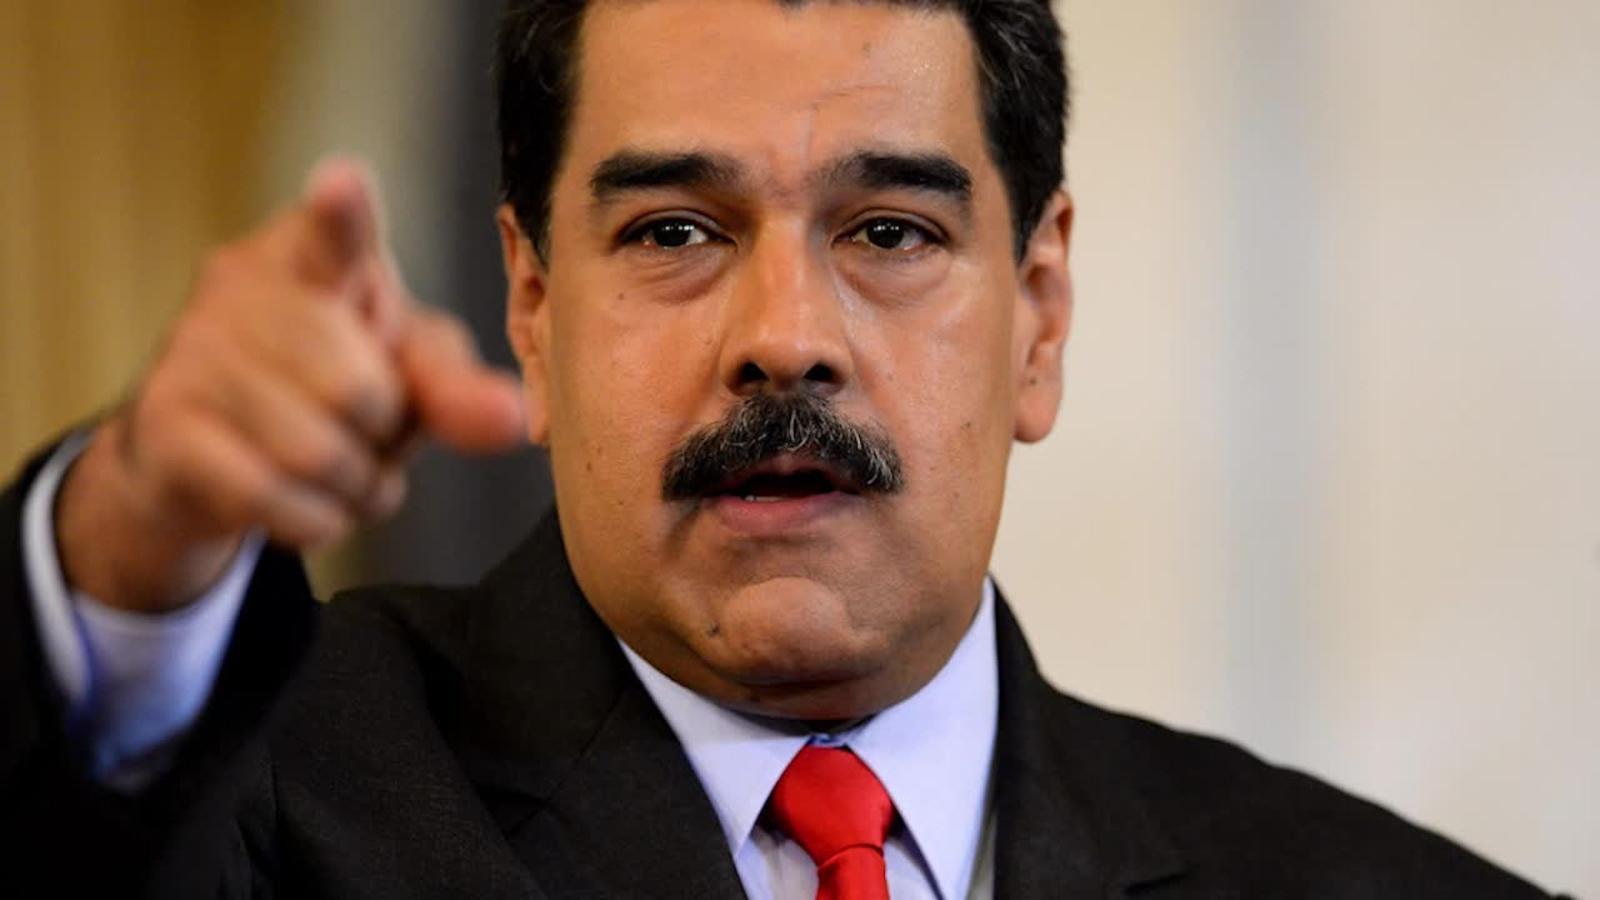 Presidente Maduro conmemora al prócer haitiano Dessalines